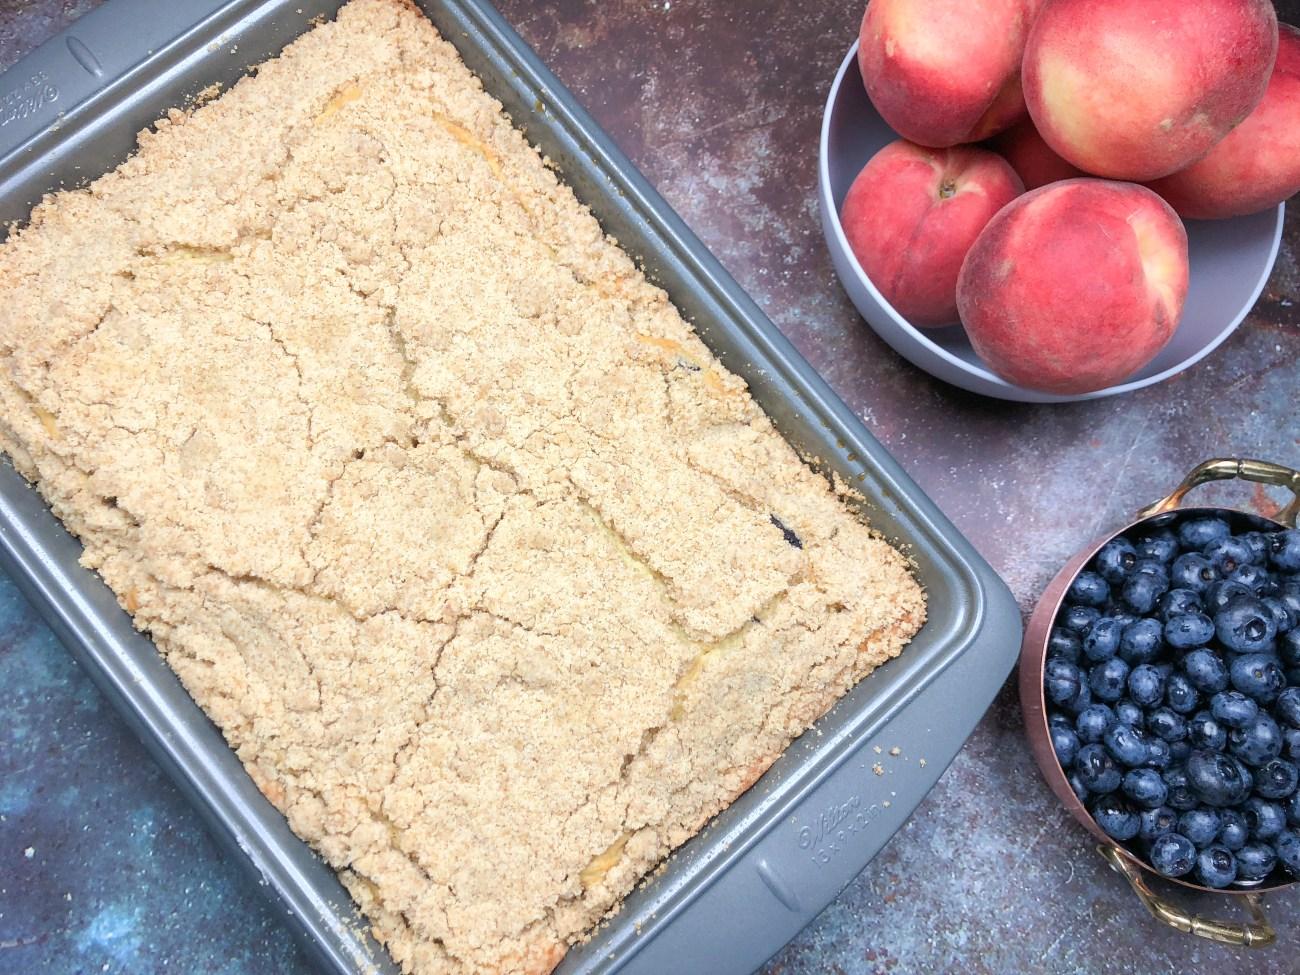 Blueberry-Peach Crumb Cake